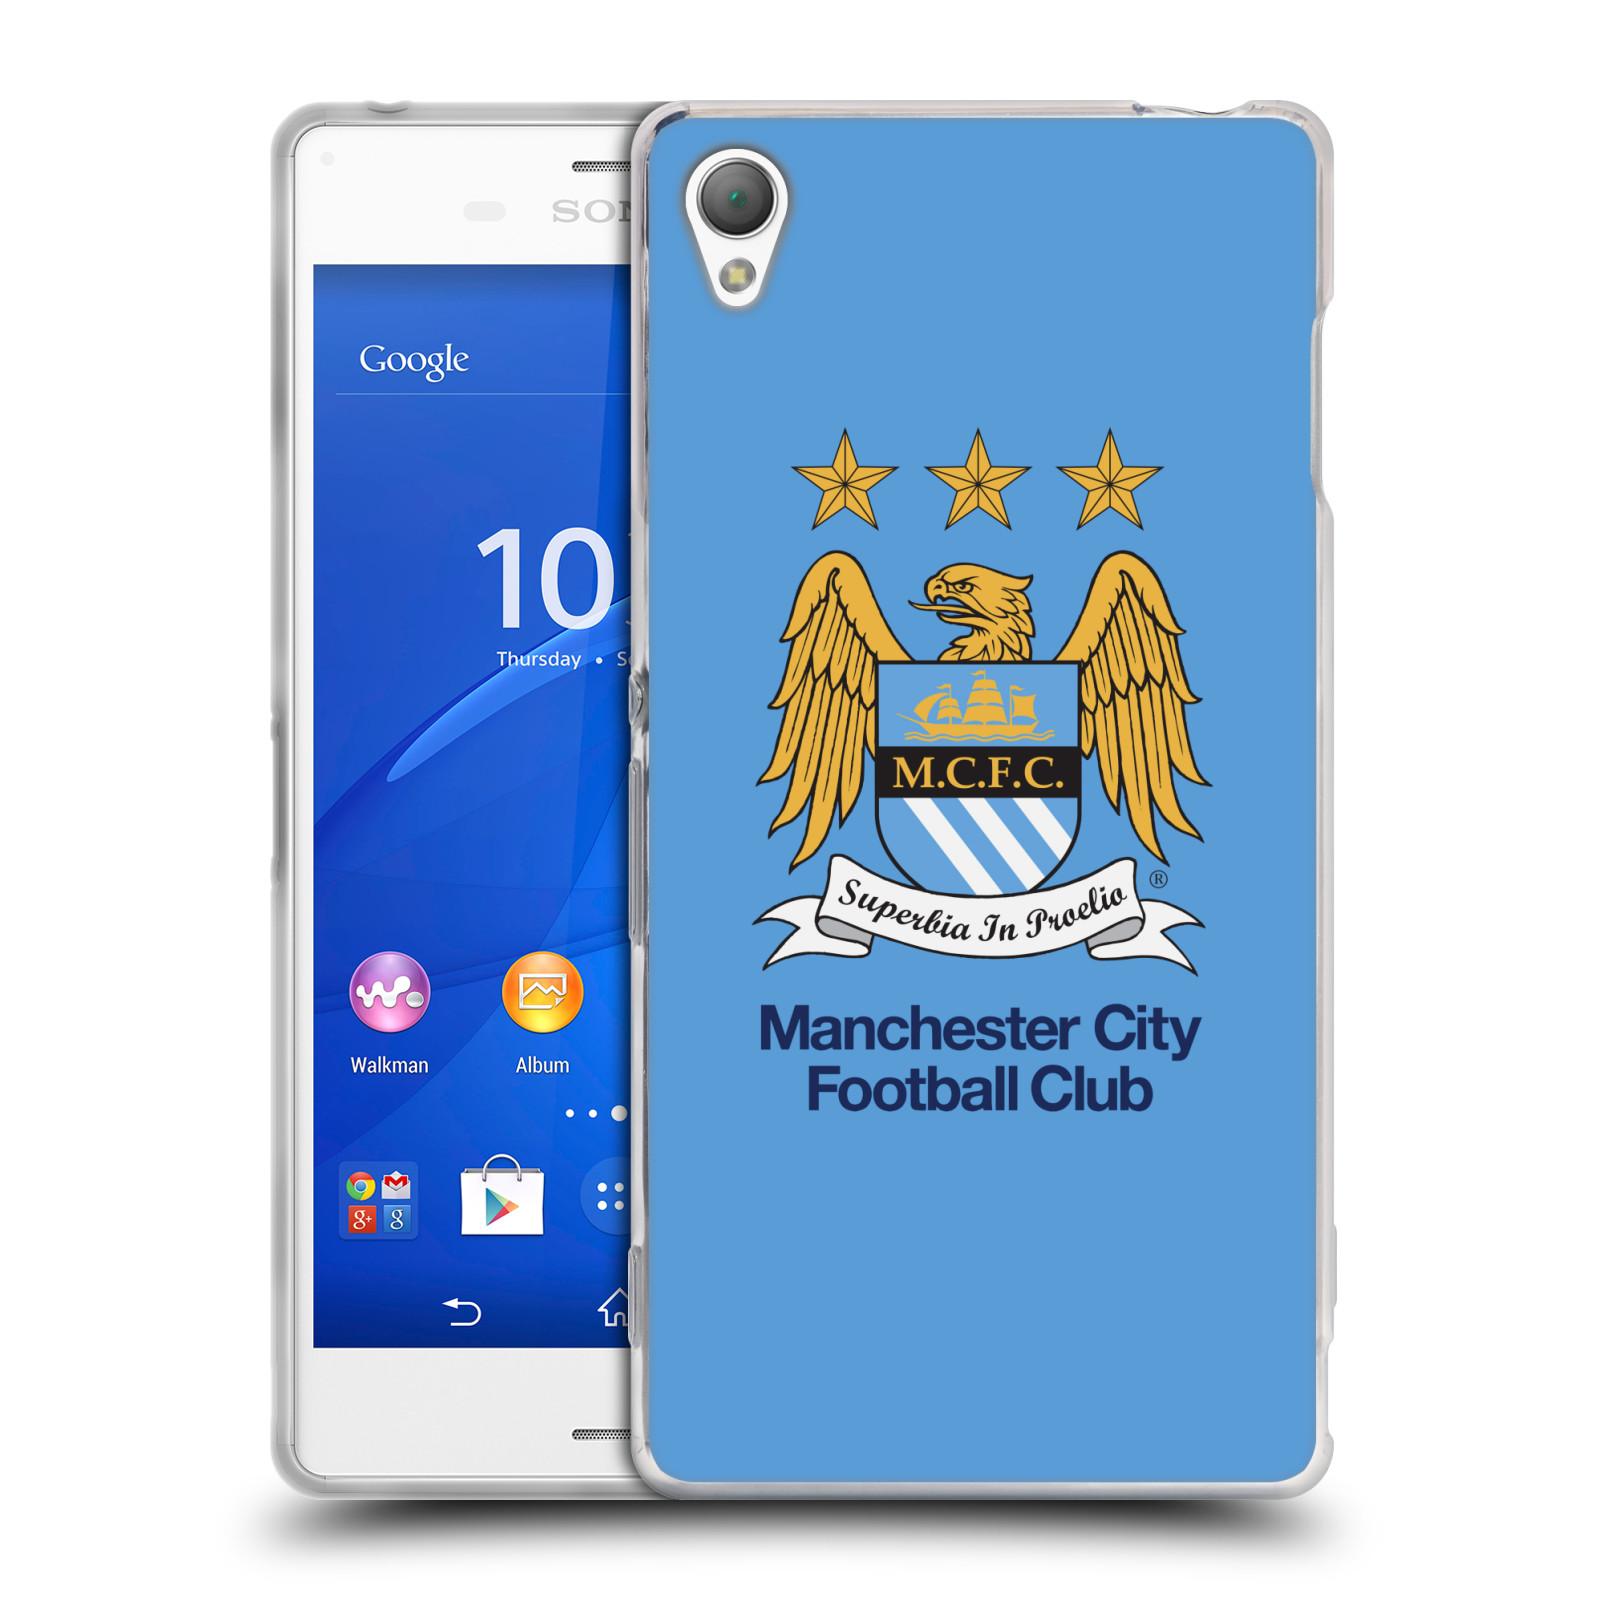 HEAD CASE silikonový obal na mobil Sony Xperia Z3 Fotbalový klub Manchester City nebesky modrá pozadí velký znak pták